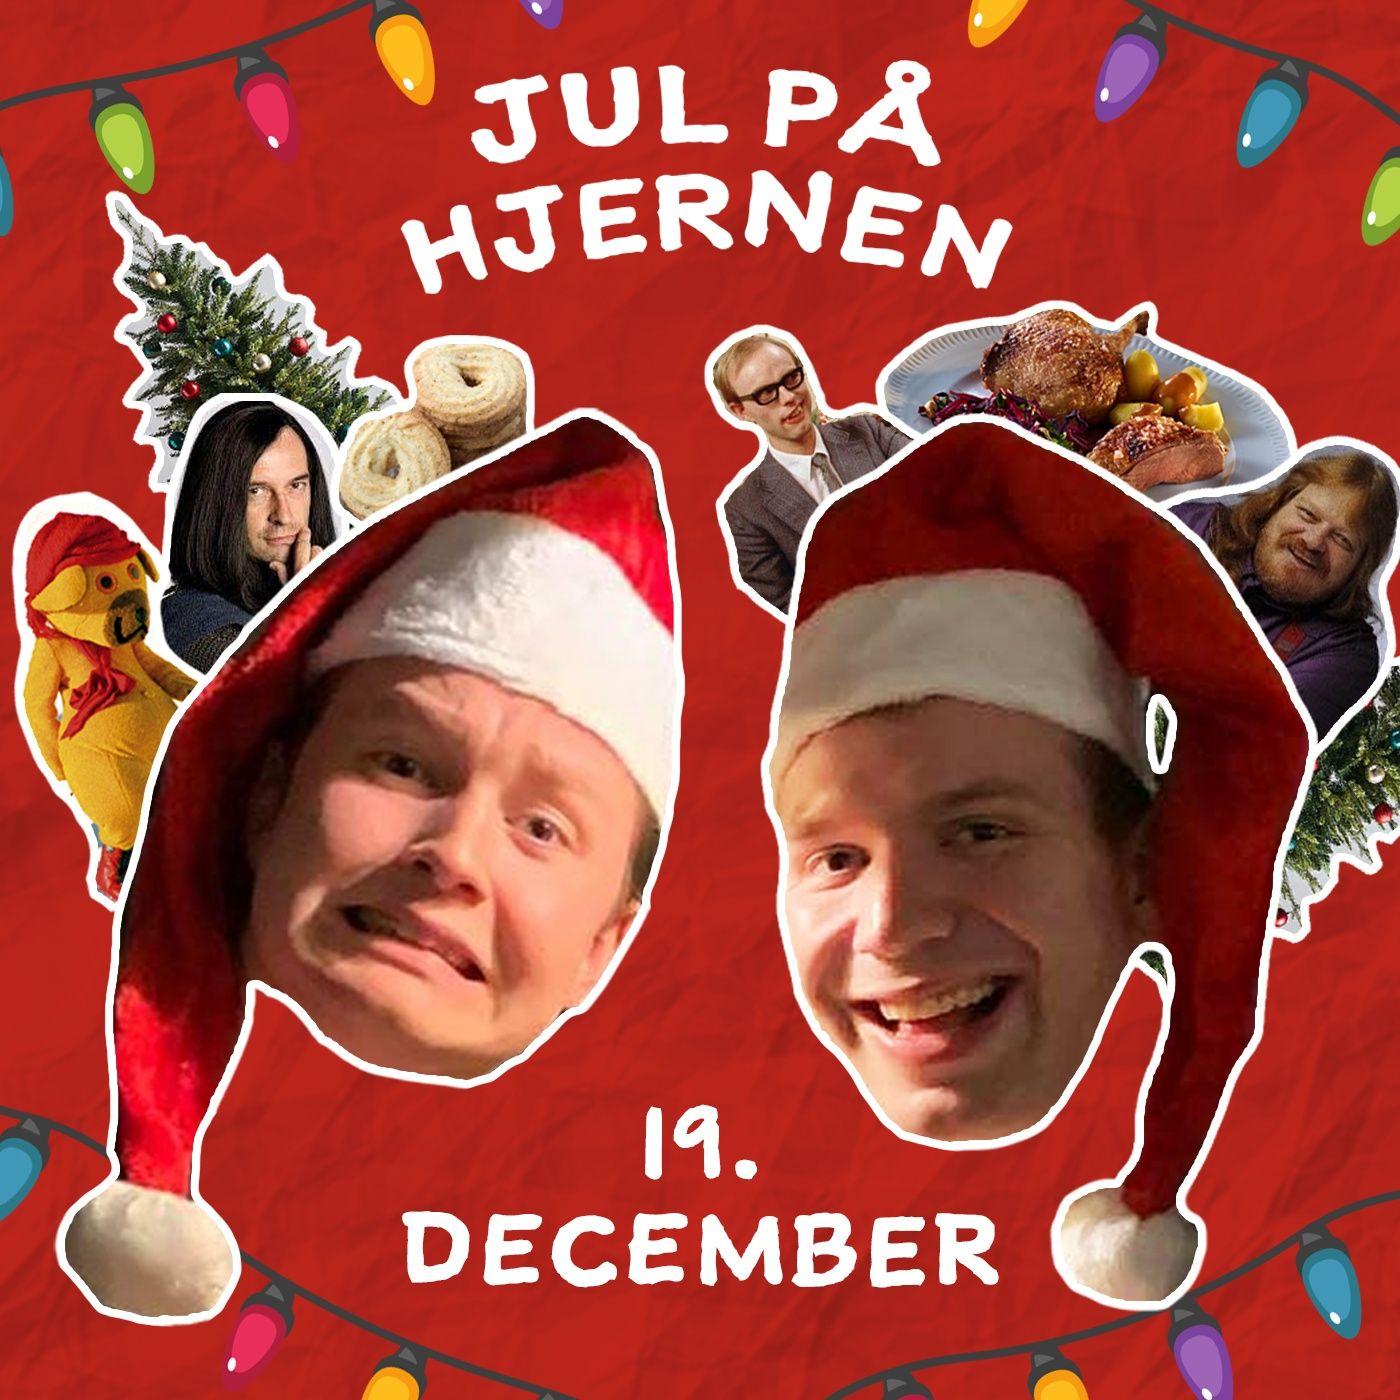 19 December - Jul på hjernen